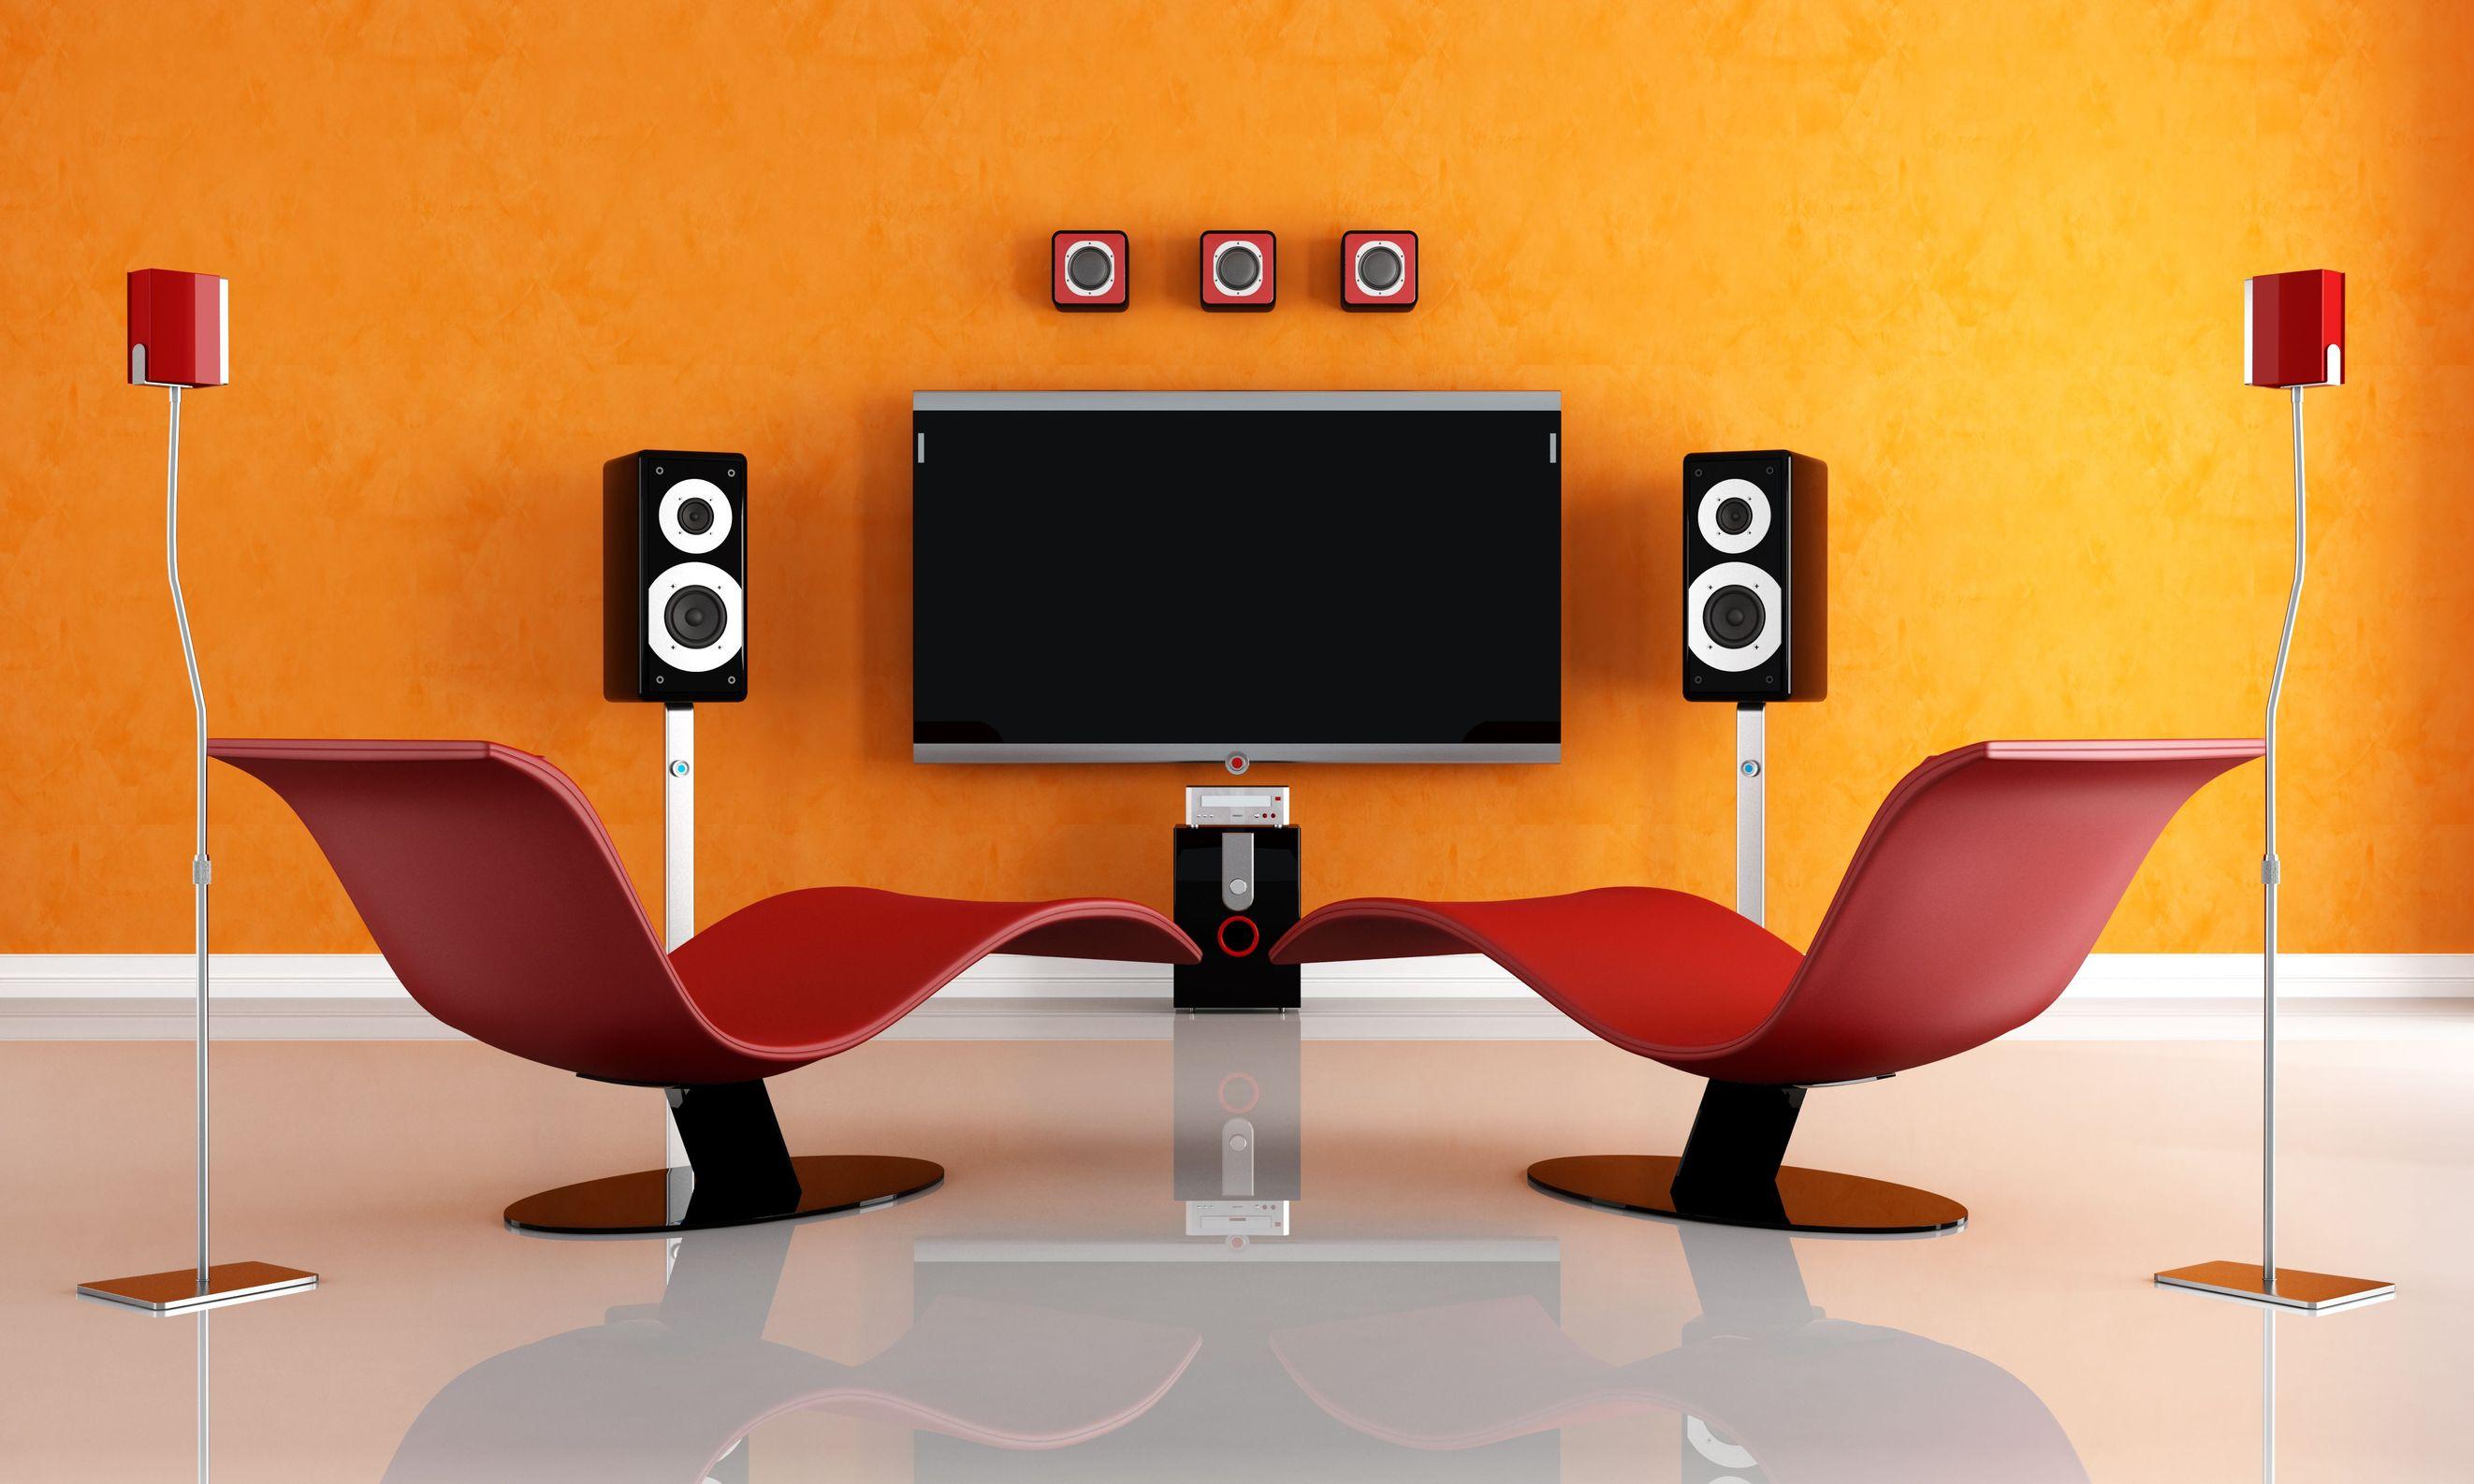 Ideal Speaker Locations For 7.1 Audio